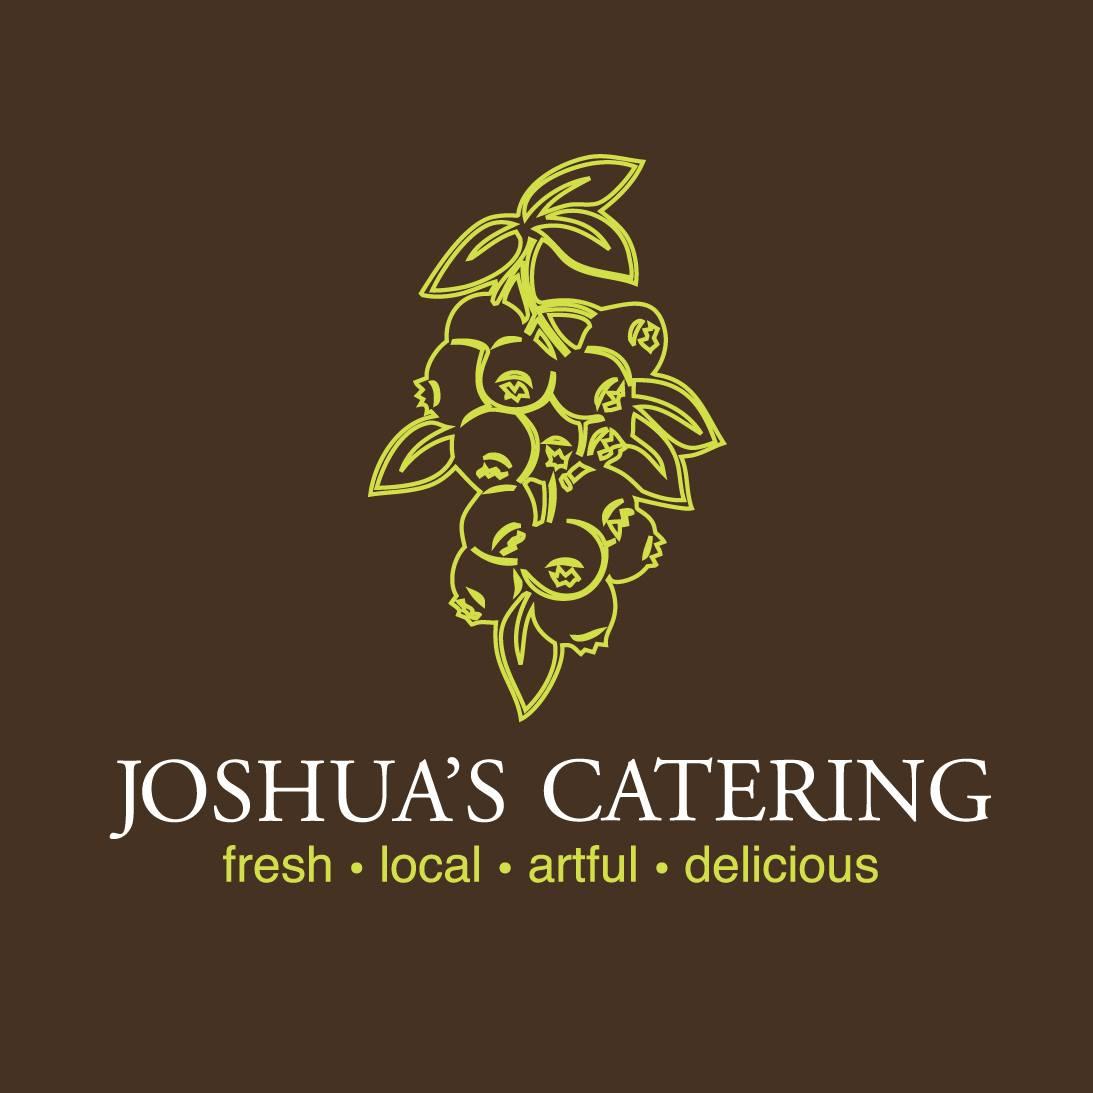 joshuas_catering_logo.jpg